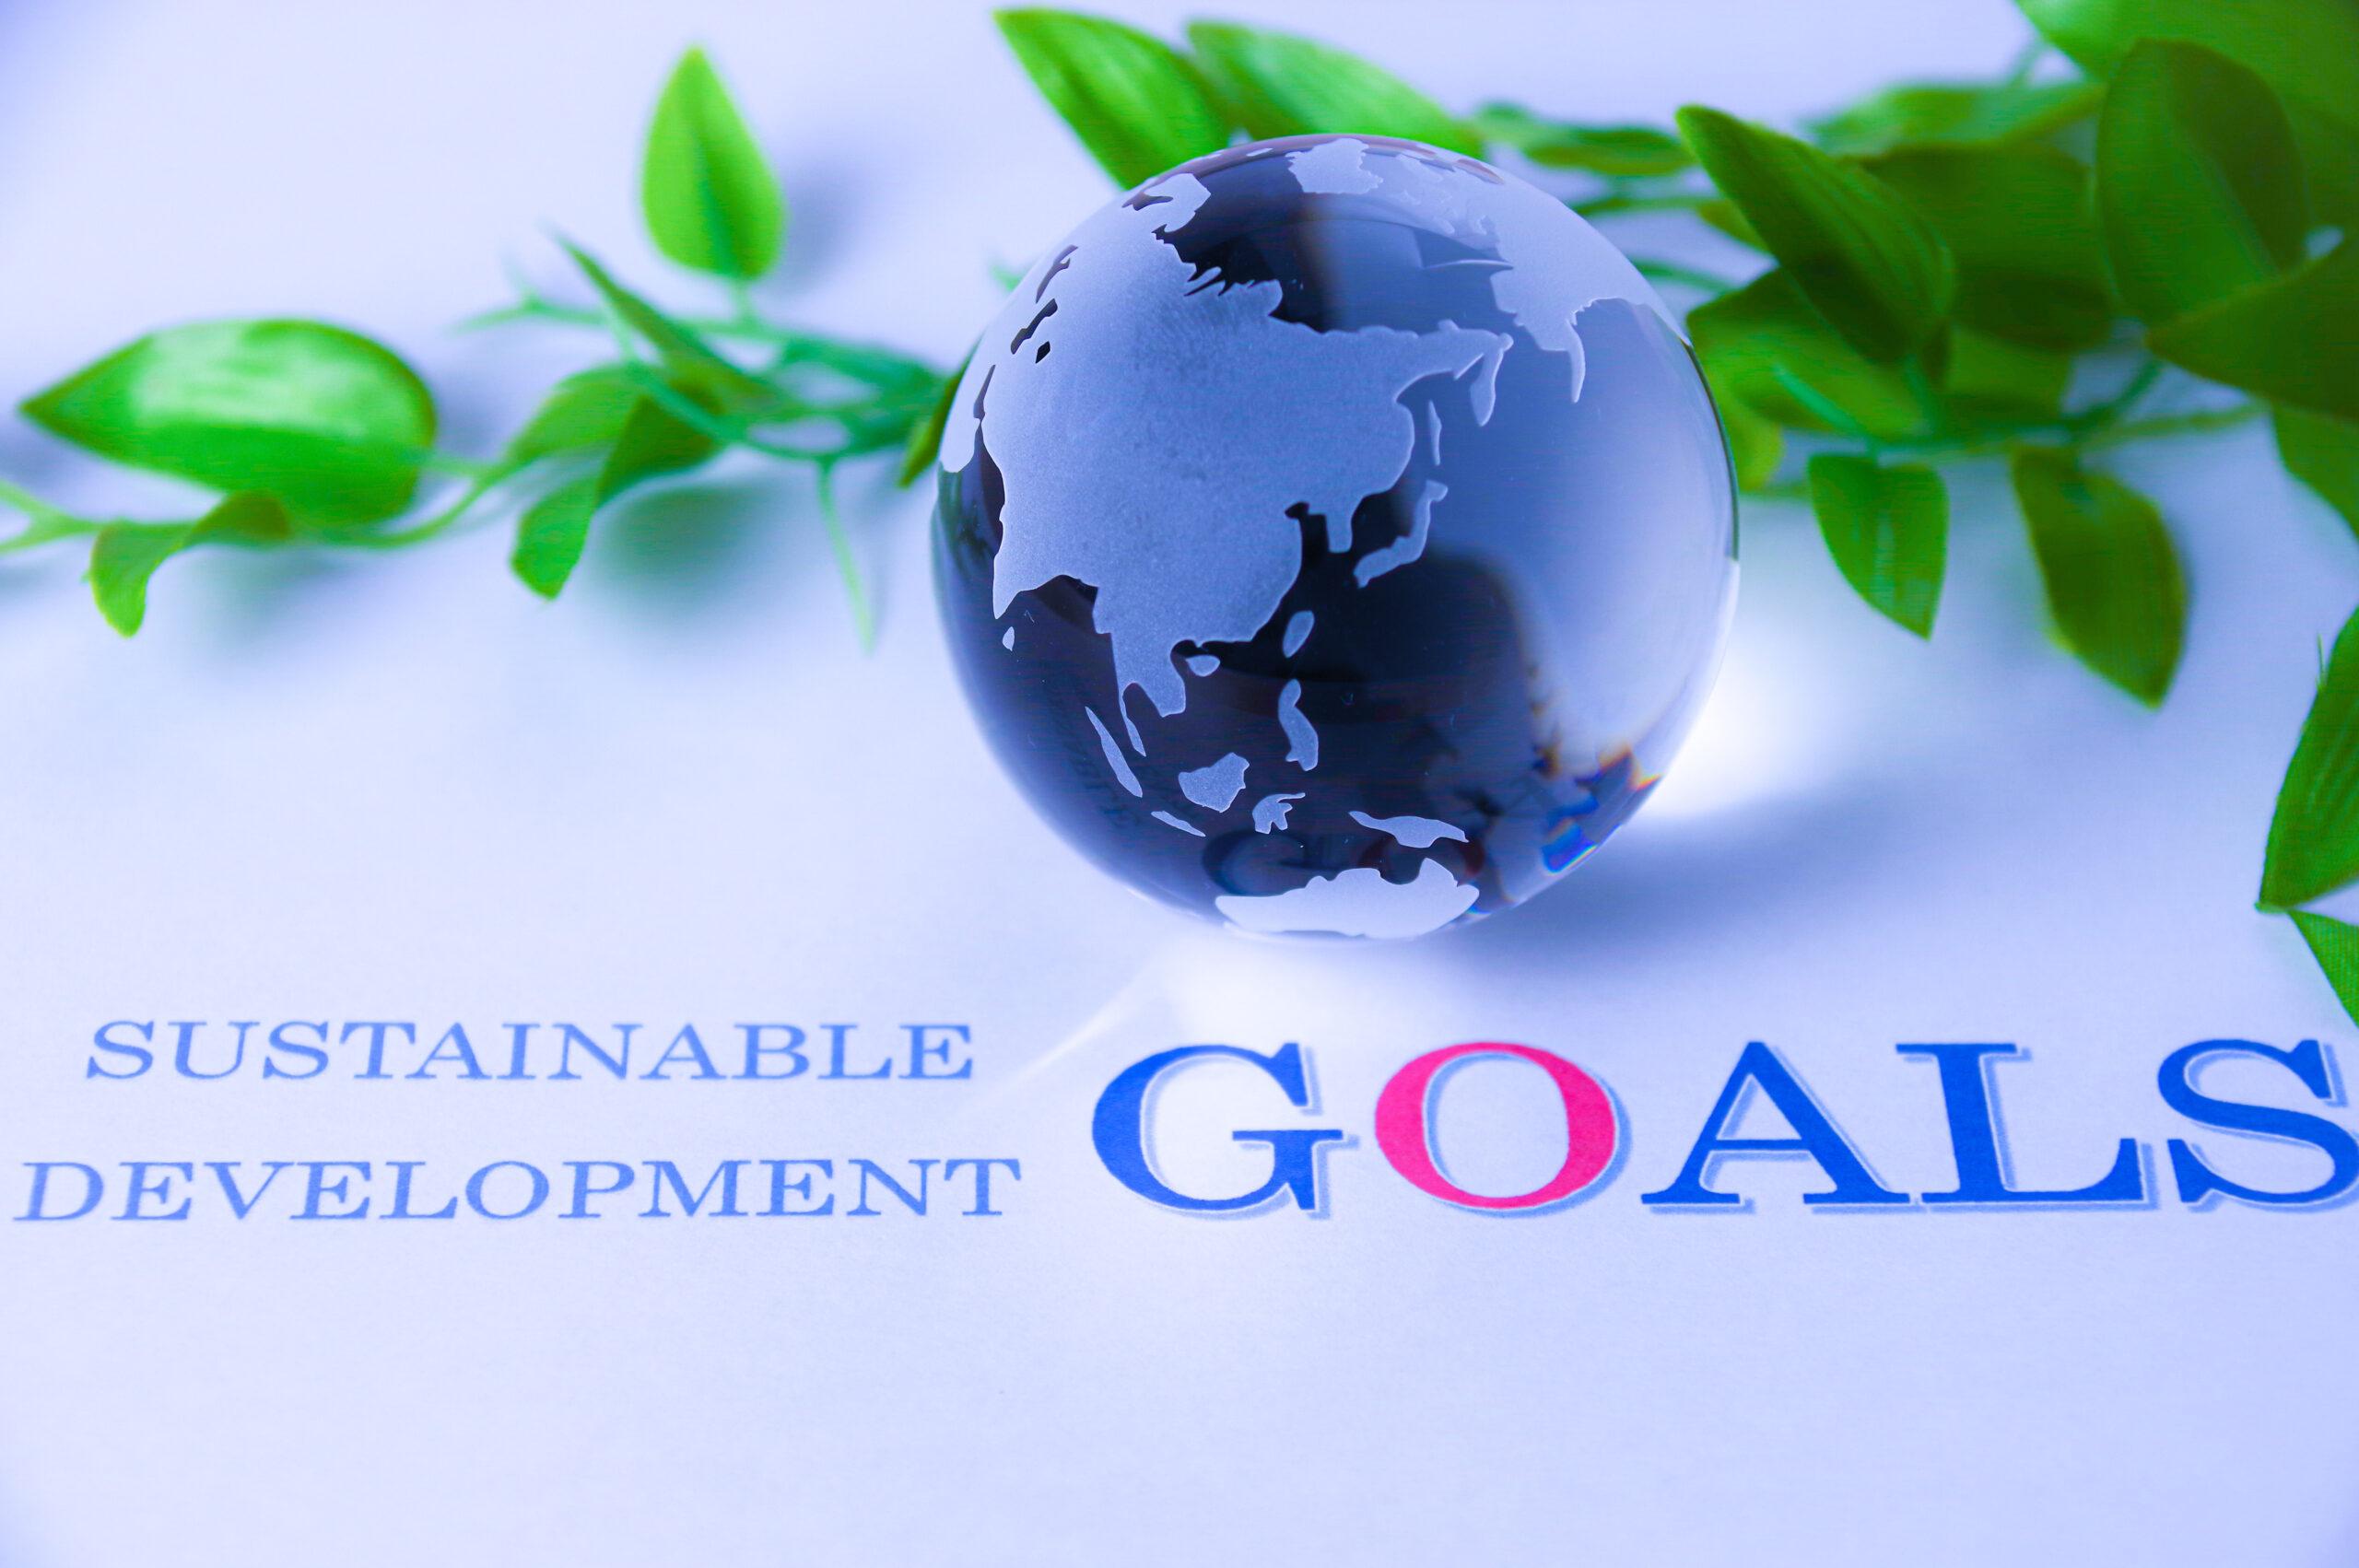 【CO2削減と光熱費削減を実現】補助金活用で工場や倉庫屋上に自家消費型太陽光発電設置のススメ